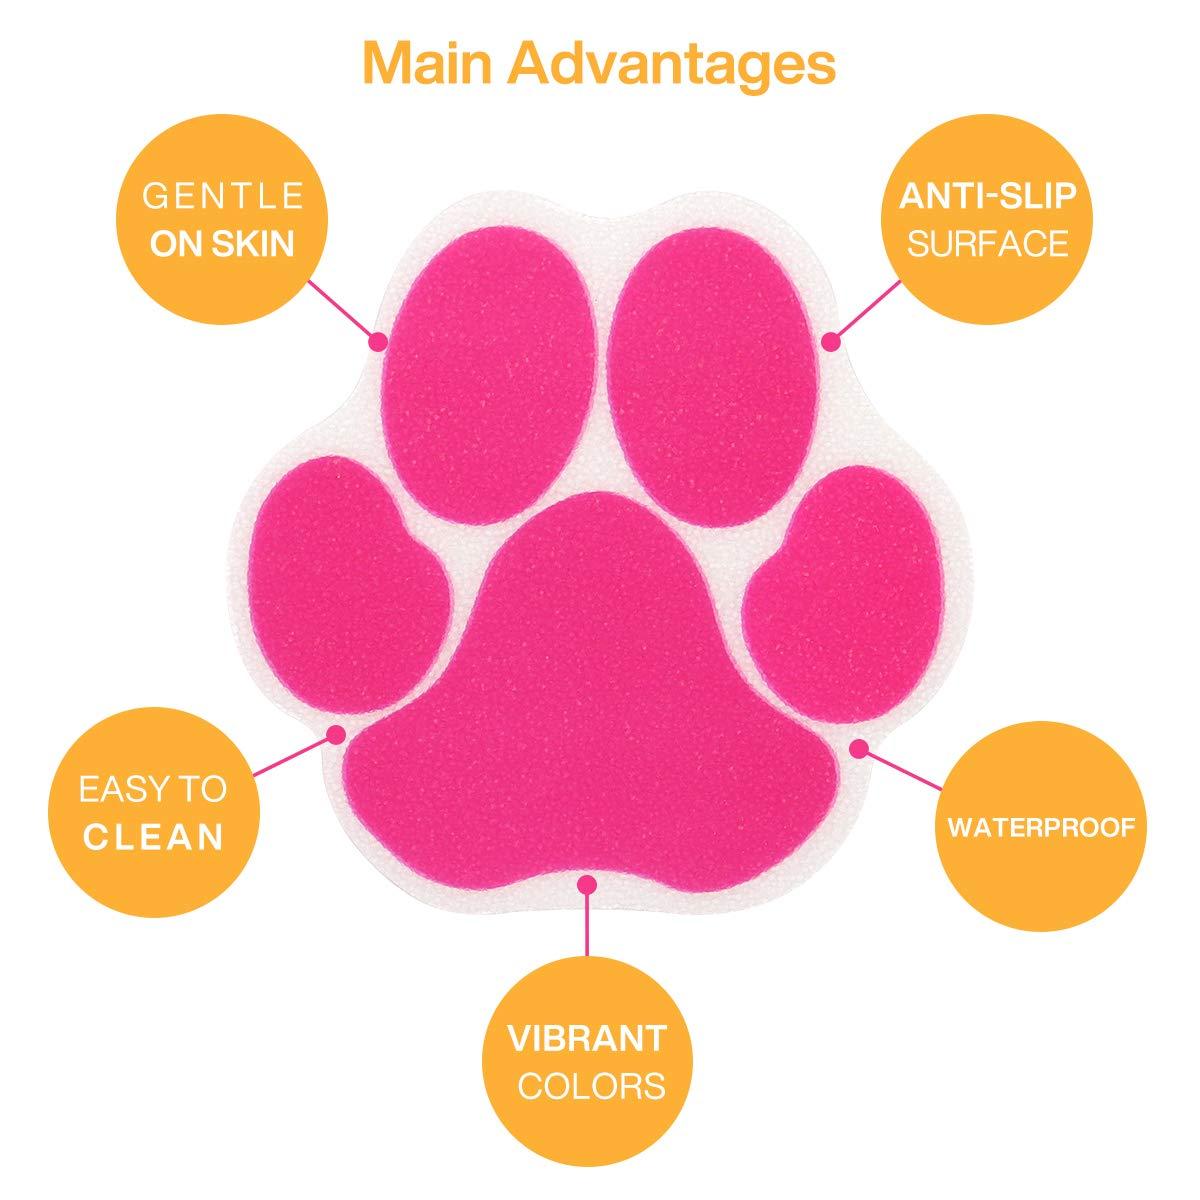 Ratgoo 12Pcs Dog Paw Footprint Non Slip Bathtub Stickers,Strong Adhesive Bathtub Appliques,Anti-Slip Bathtub Decals for Tub,Stairs,Kitchen,Shower Room,Treads,Bath Room,Floor,Swimming Pool. Pink